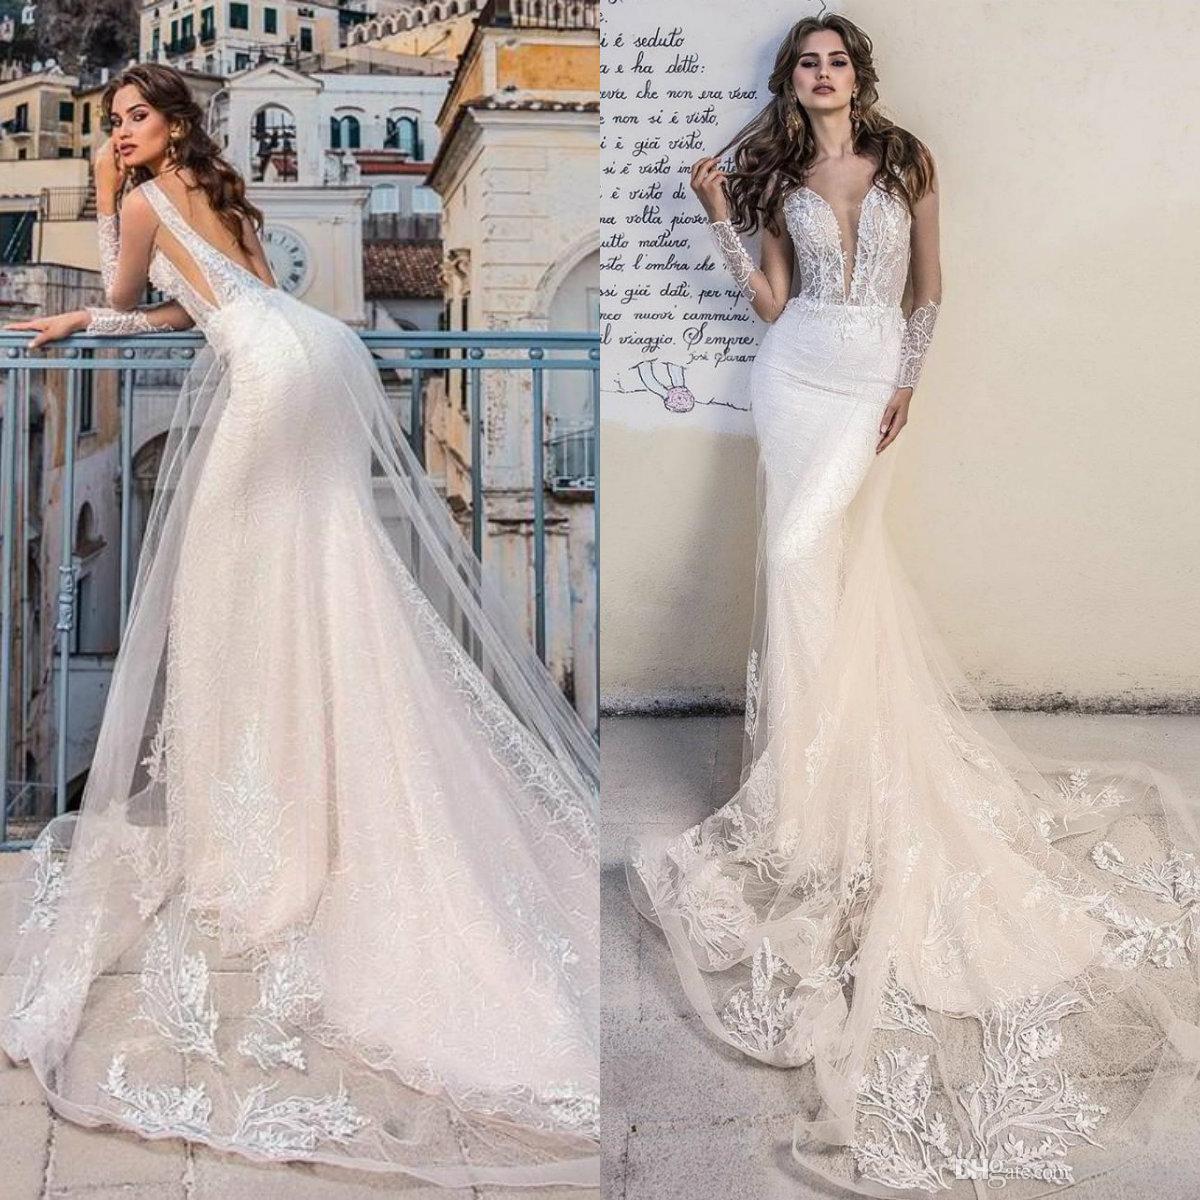 Long Sleeve Casual Wedding Dresses Pemerintah Kota Ambon